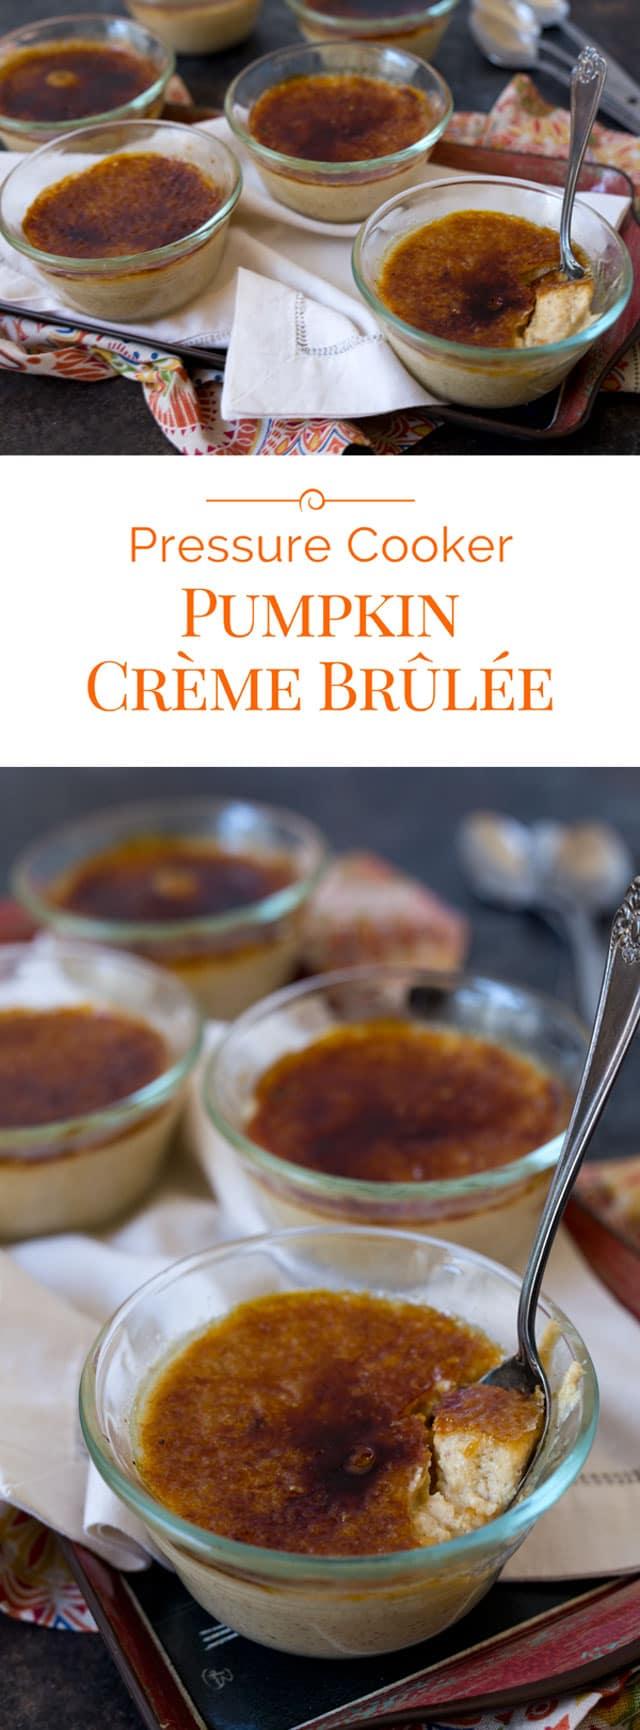 Pressure Cooker Pumpkin Crème Brûlée photo collage